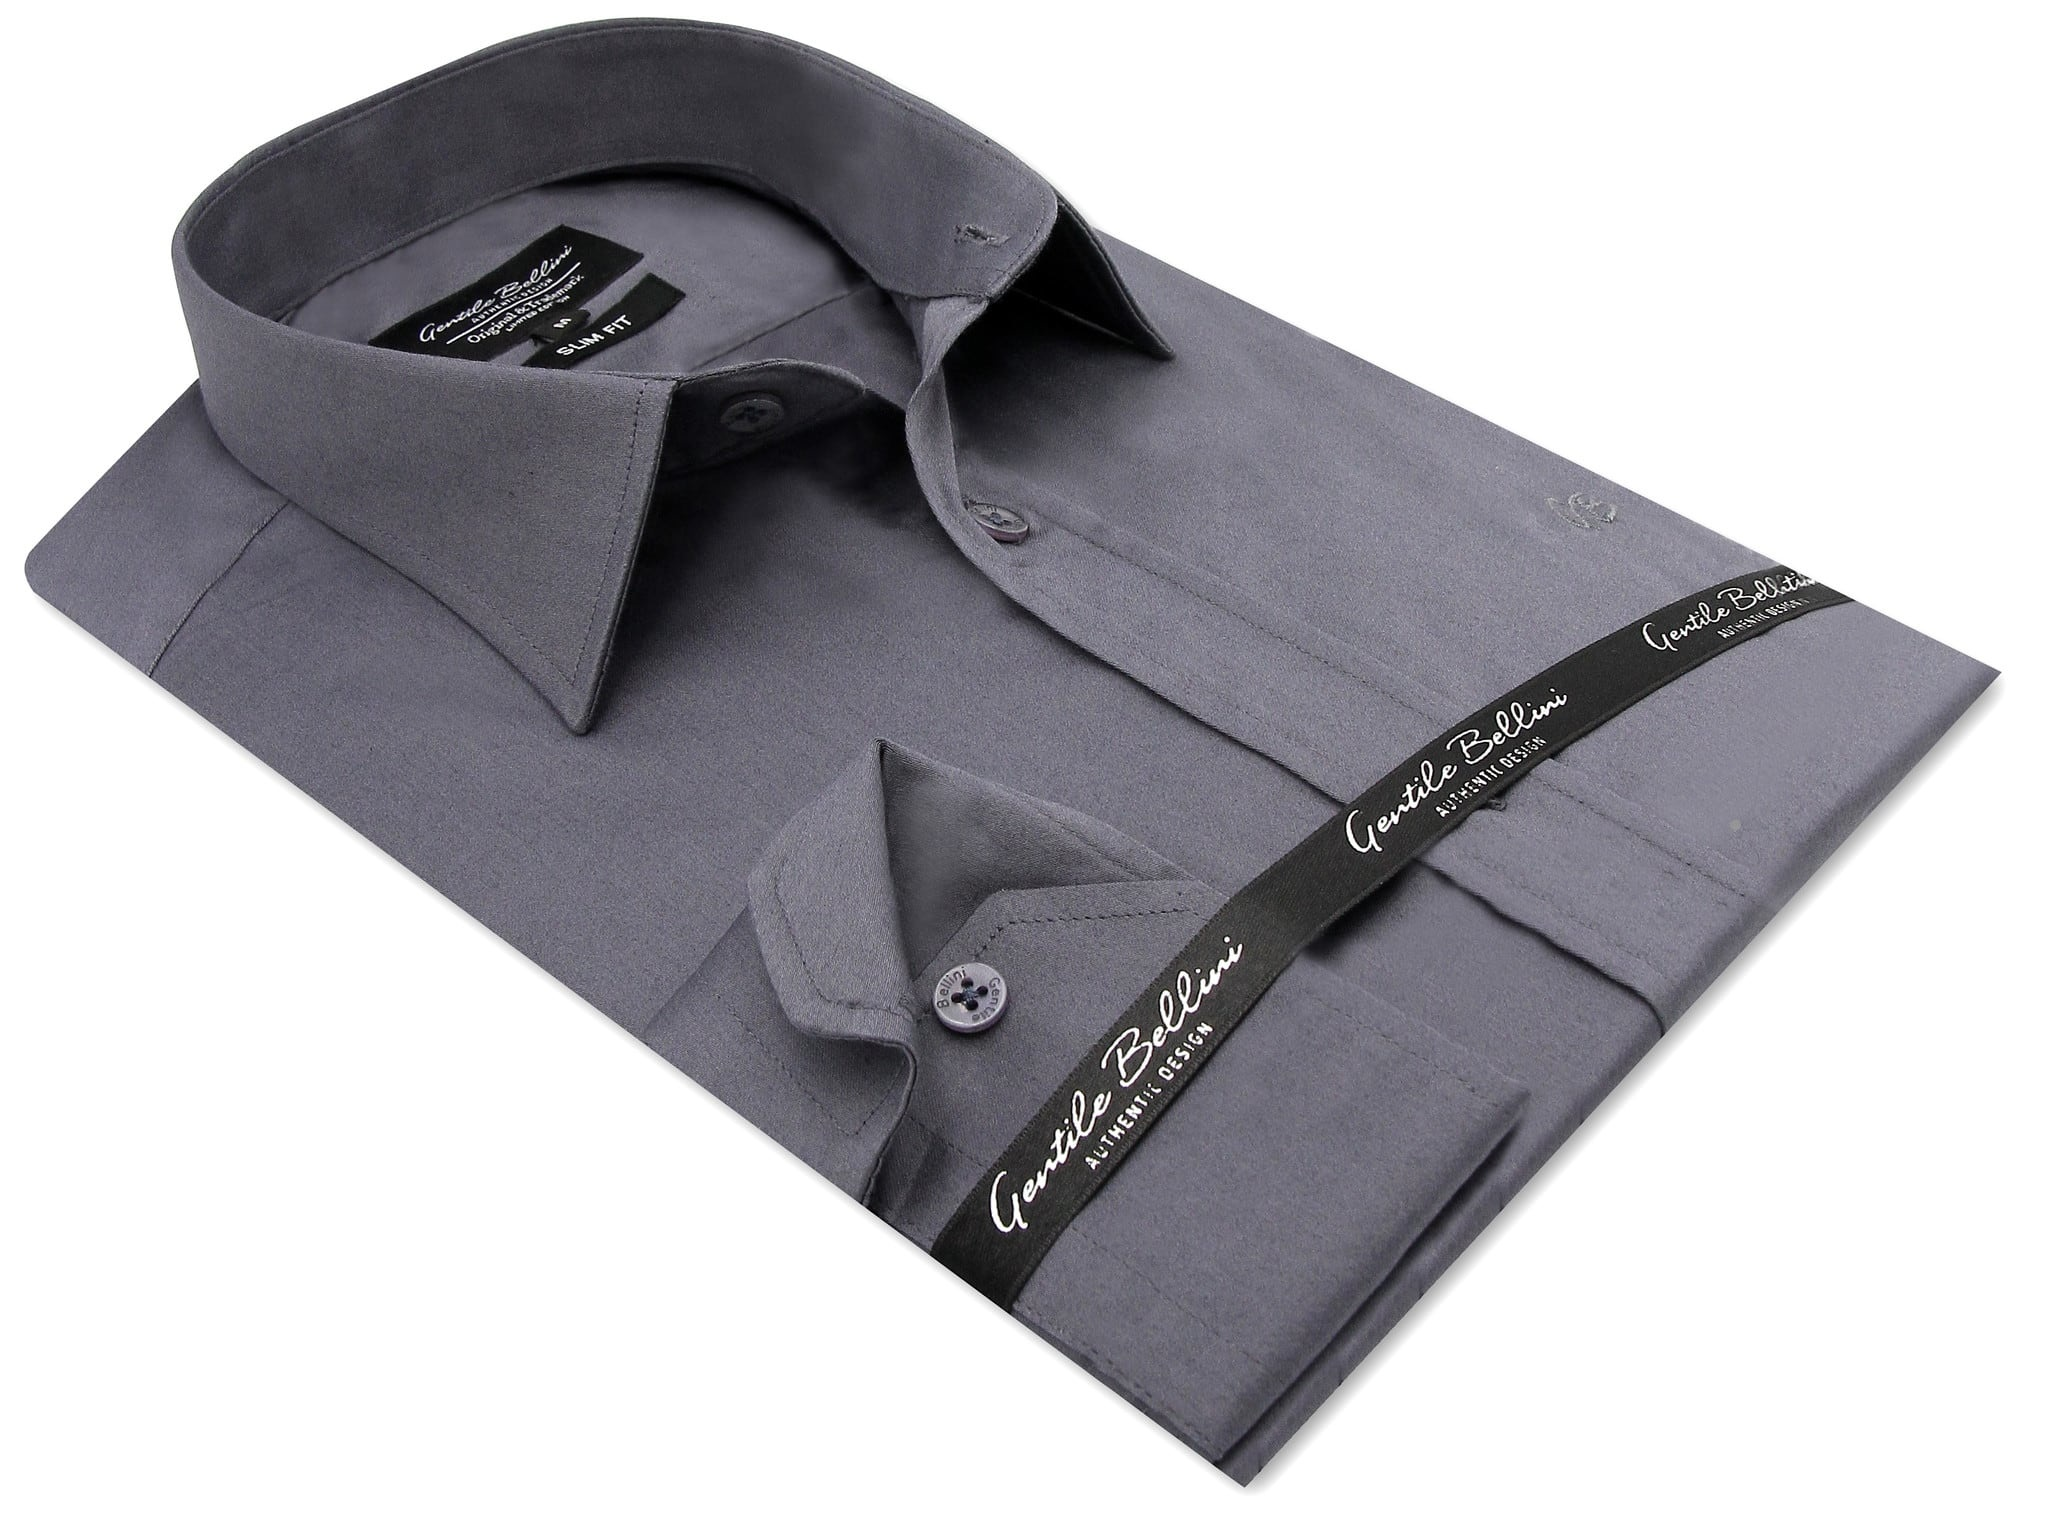 Heren Overhemd - Luxury Plain Satin - Grijs-3